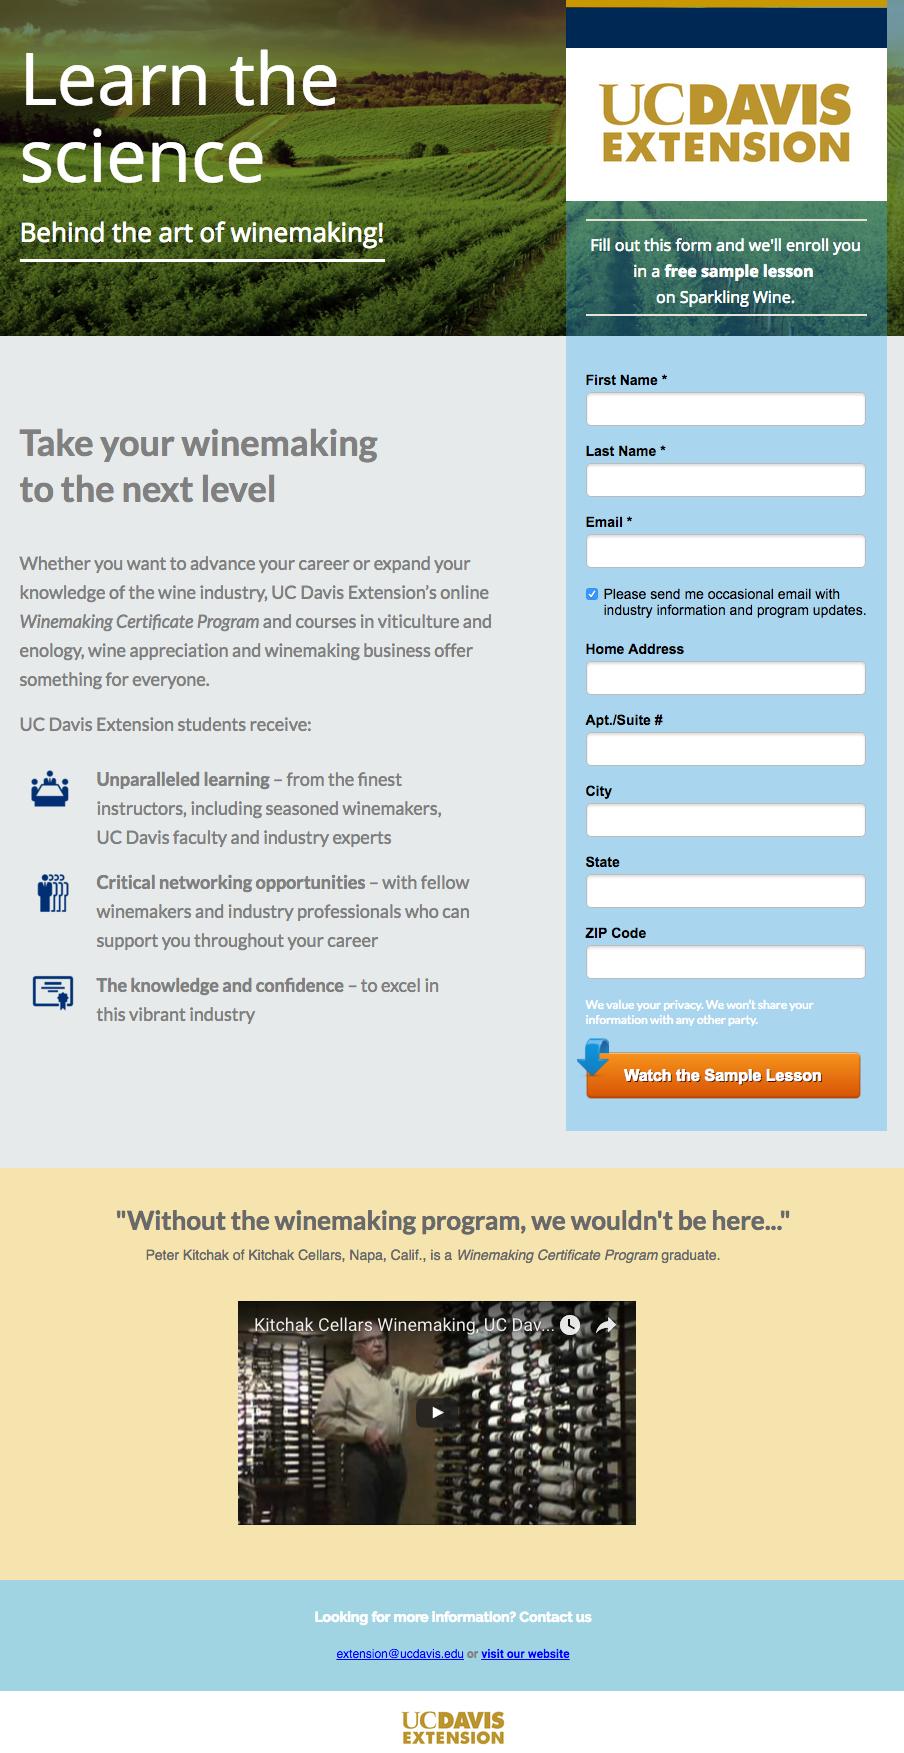 uc-davis-art-of-winemaking-landing-page-example.png